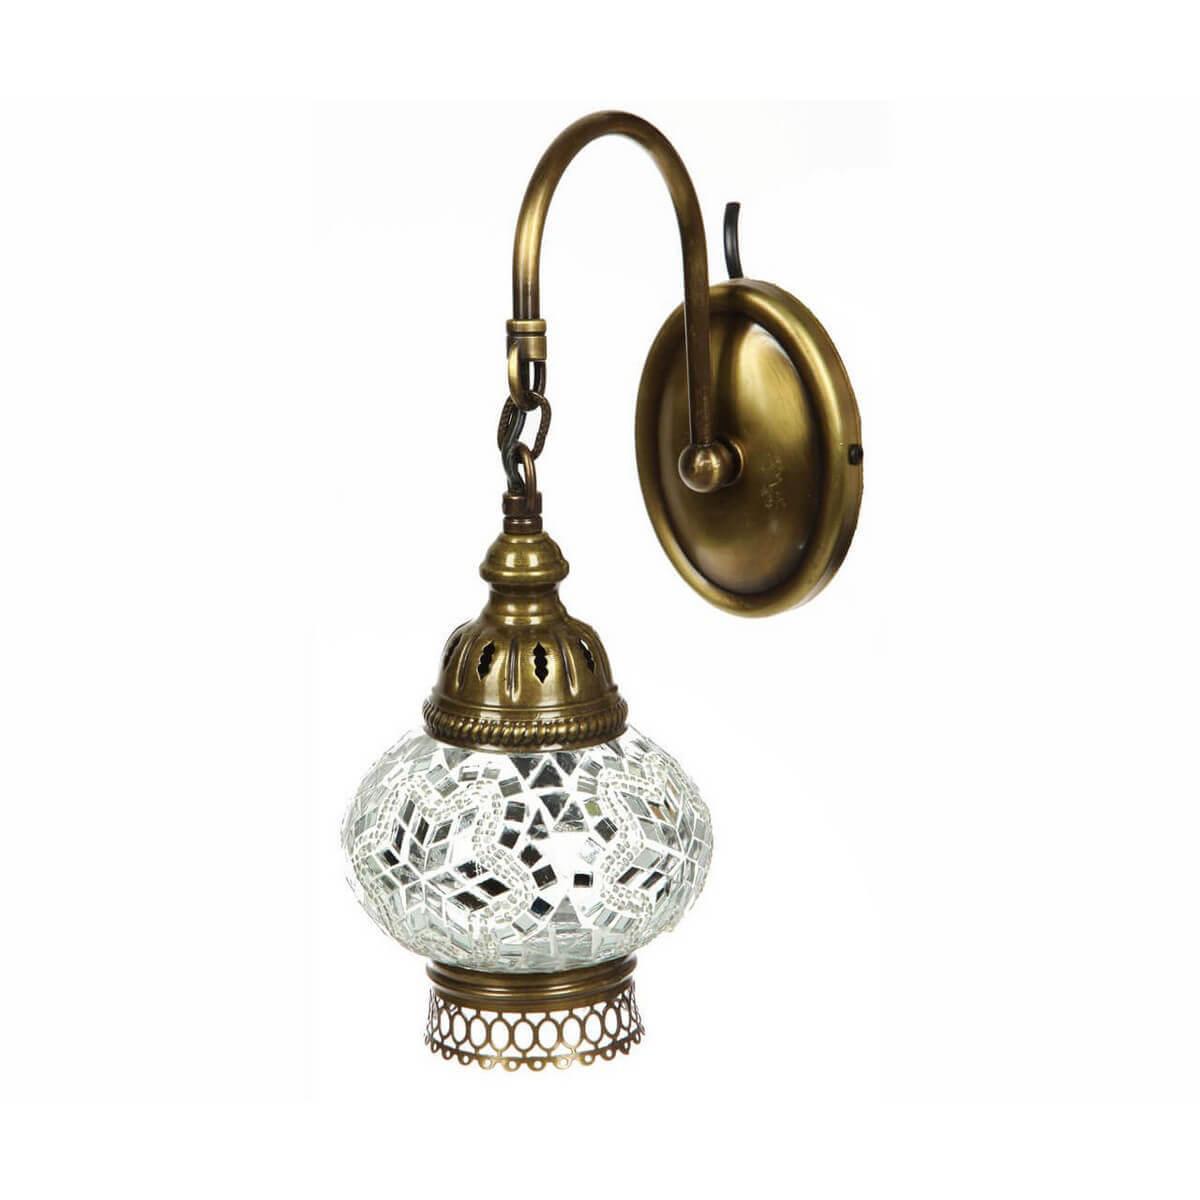 Бра Kink Light 0812TA,01 Марокко косметика из марокко купить